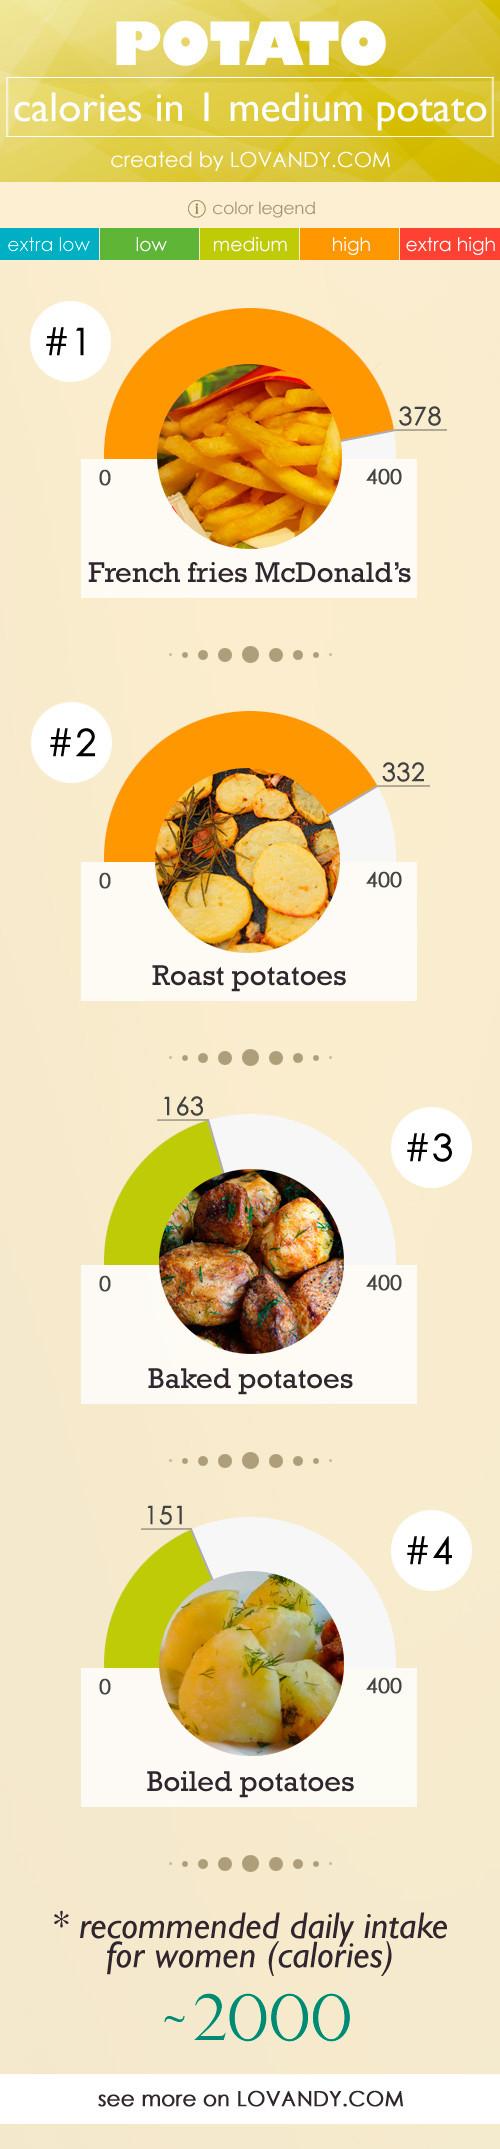 How Many Calories In Baked Potato  Potato Calories Baked Mashed Roast per 1 potato 100g